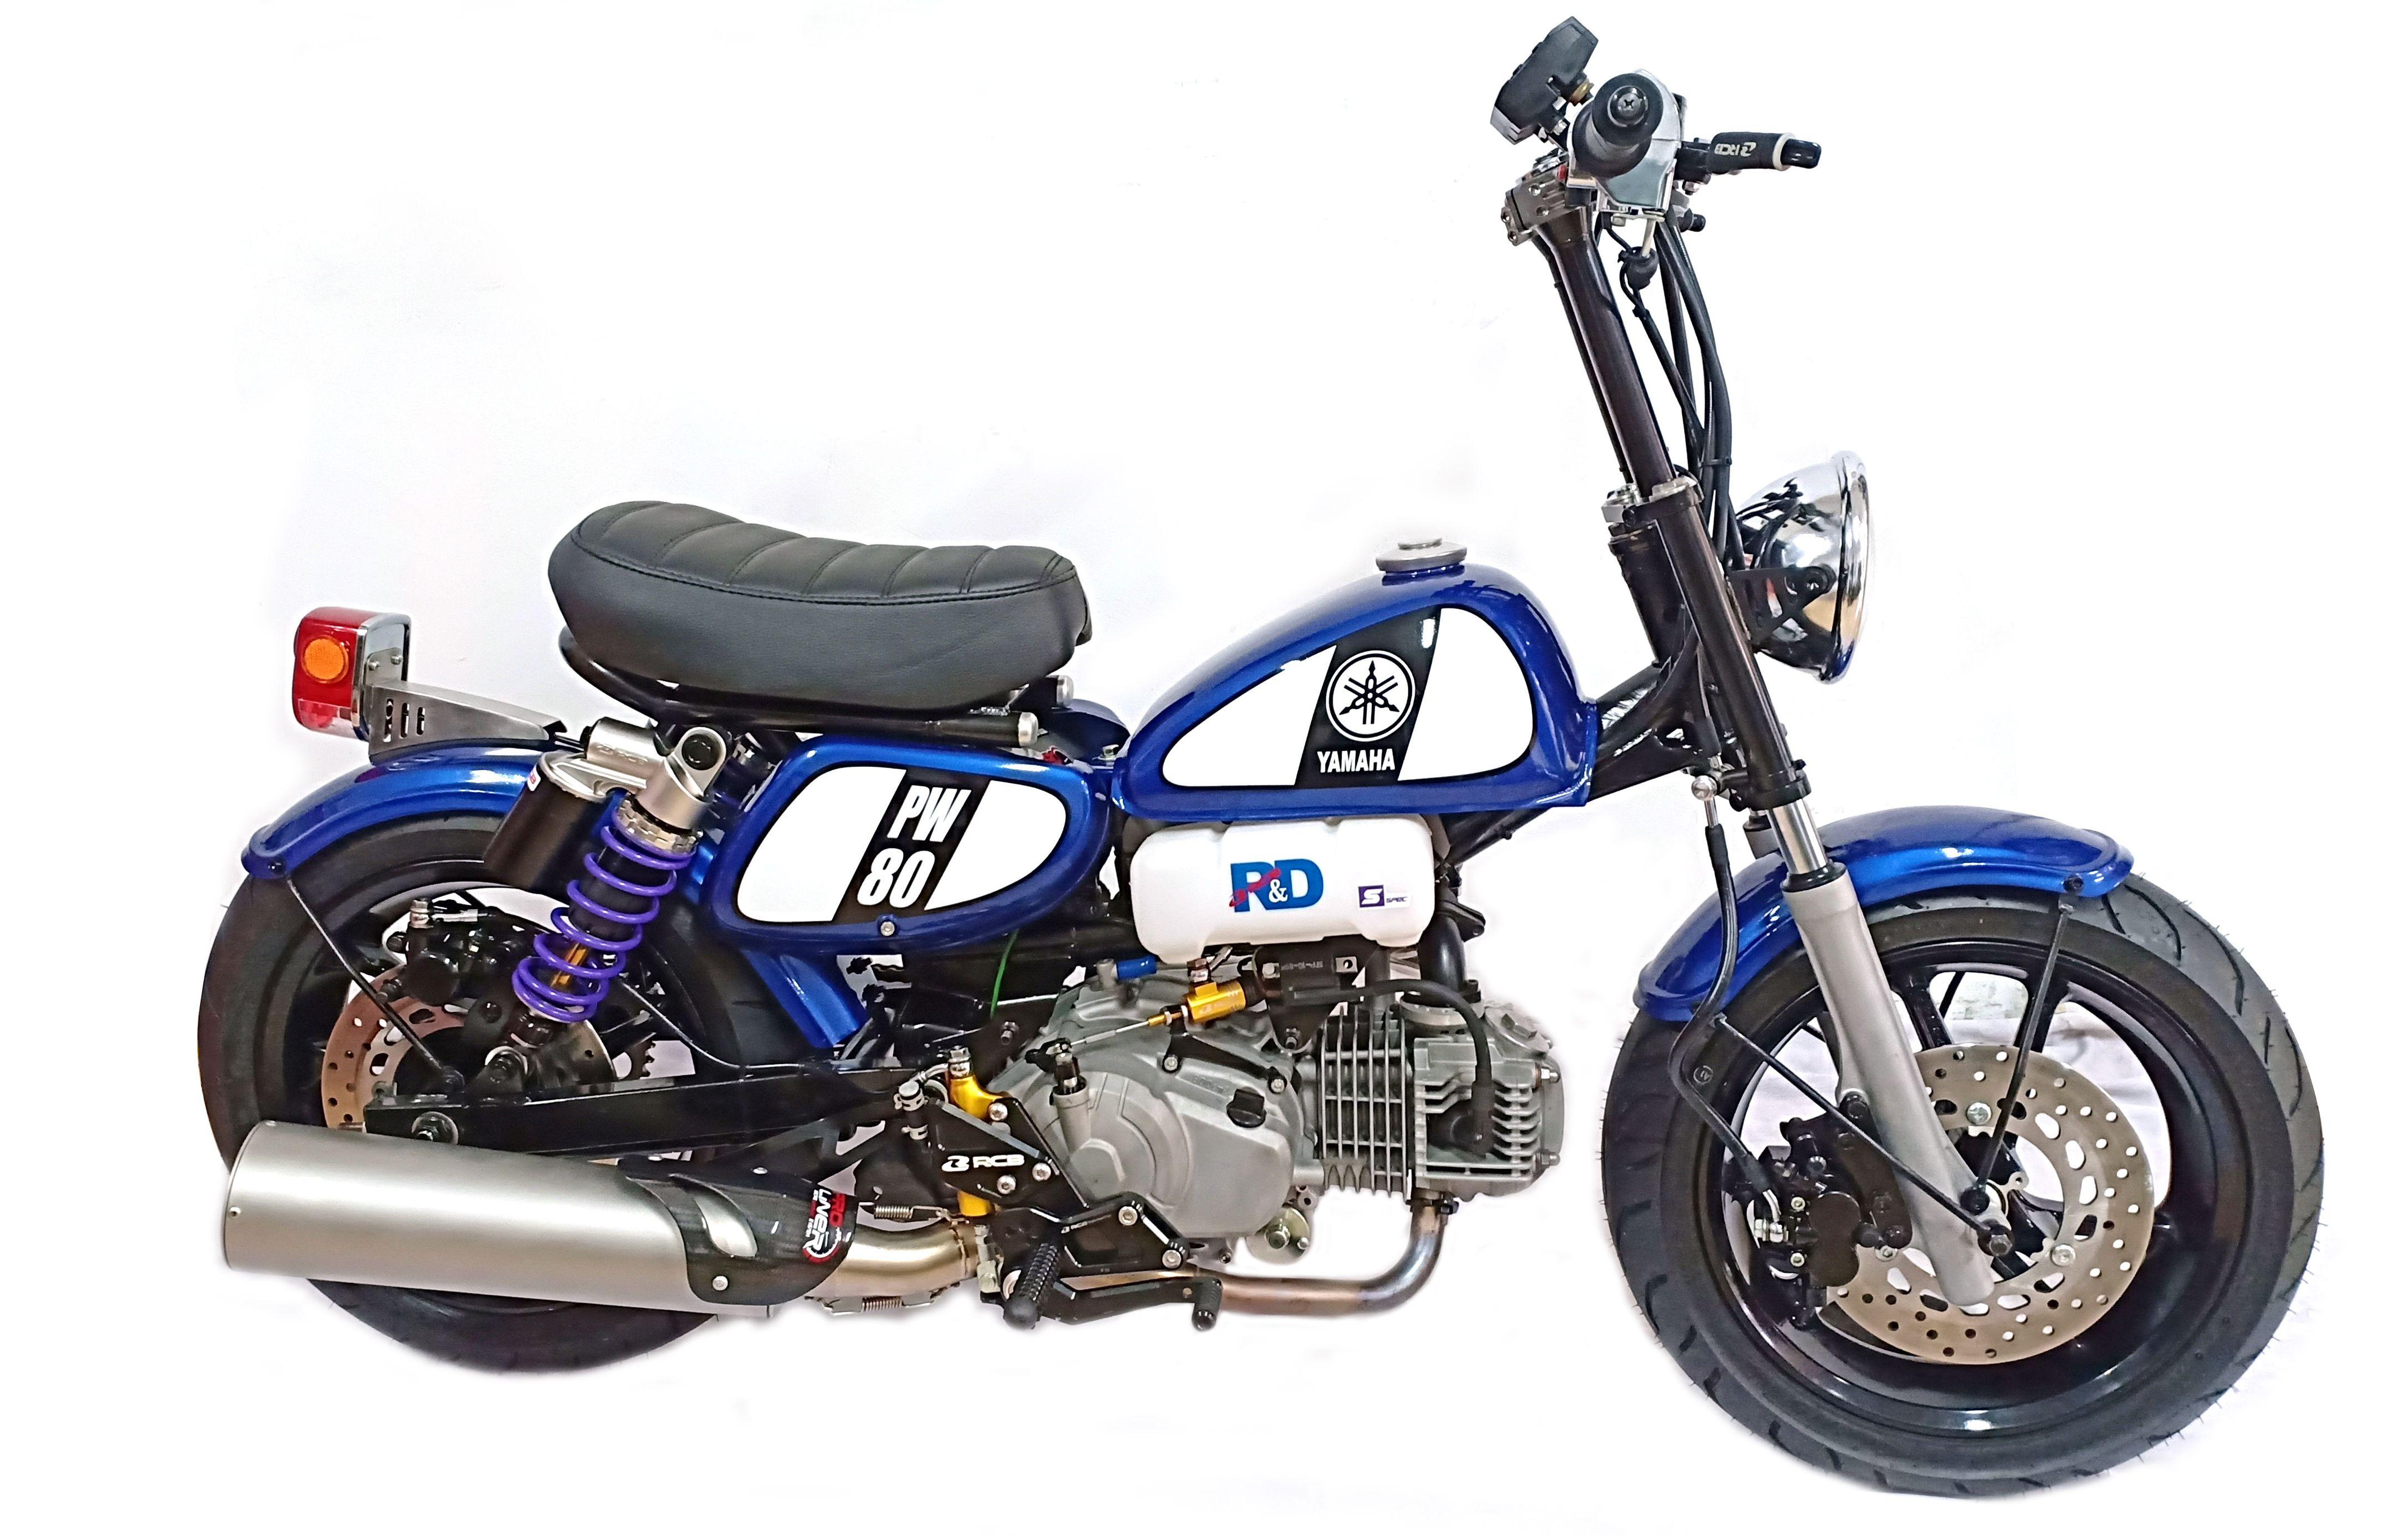 Yamaha Yaki Dikira Motor Keluaran Pabrik Padahal Hasil Modif Semua Halaman Motorplus